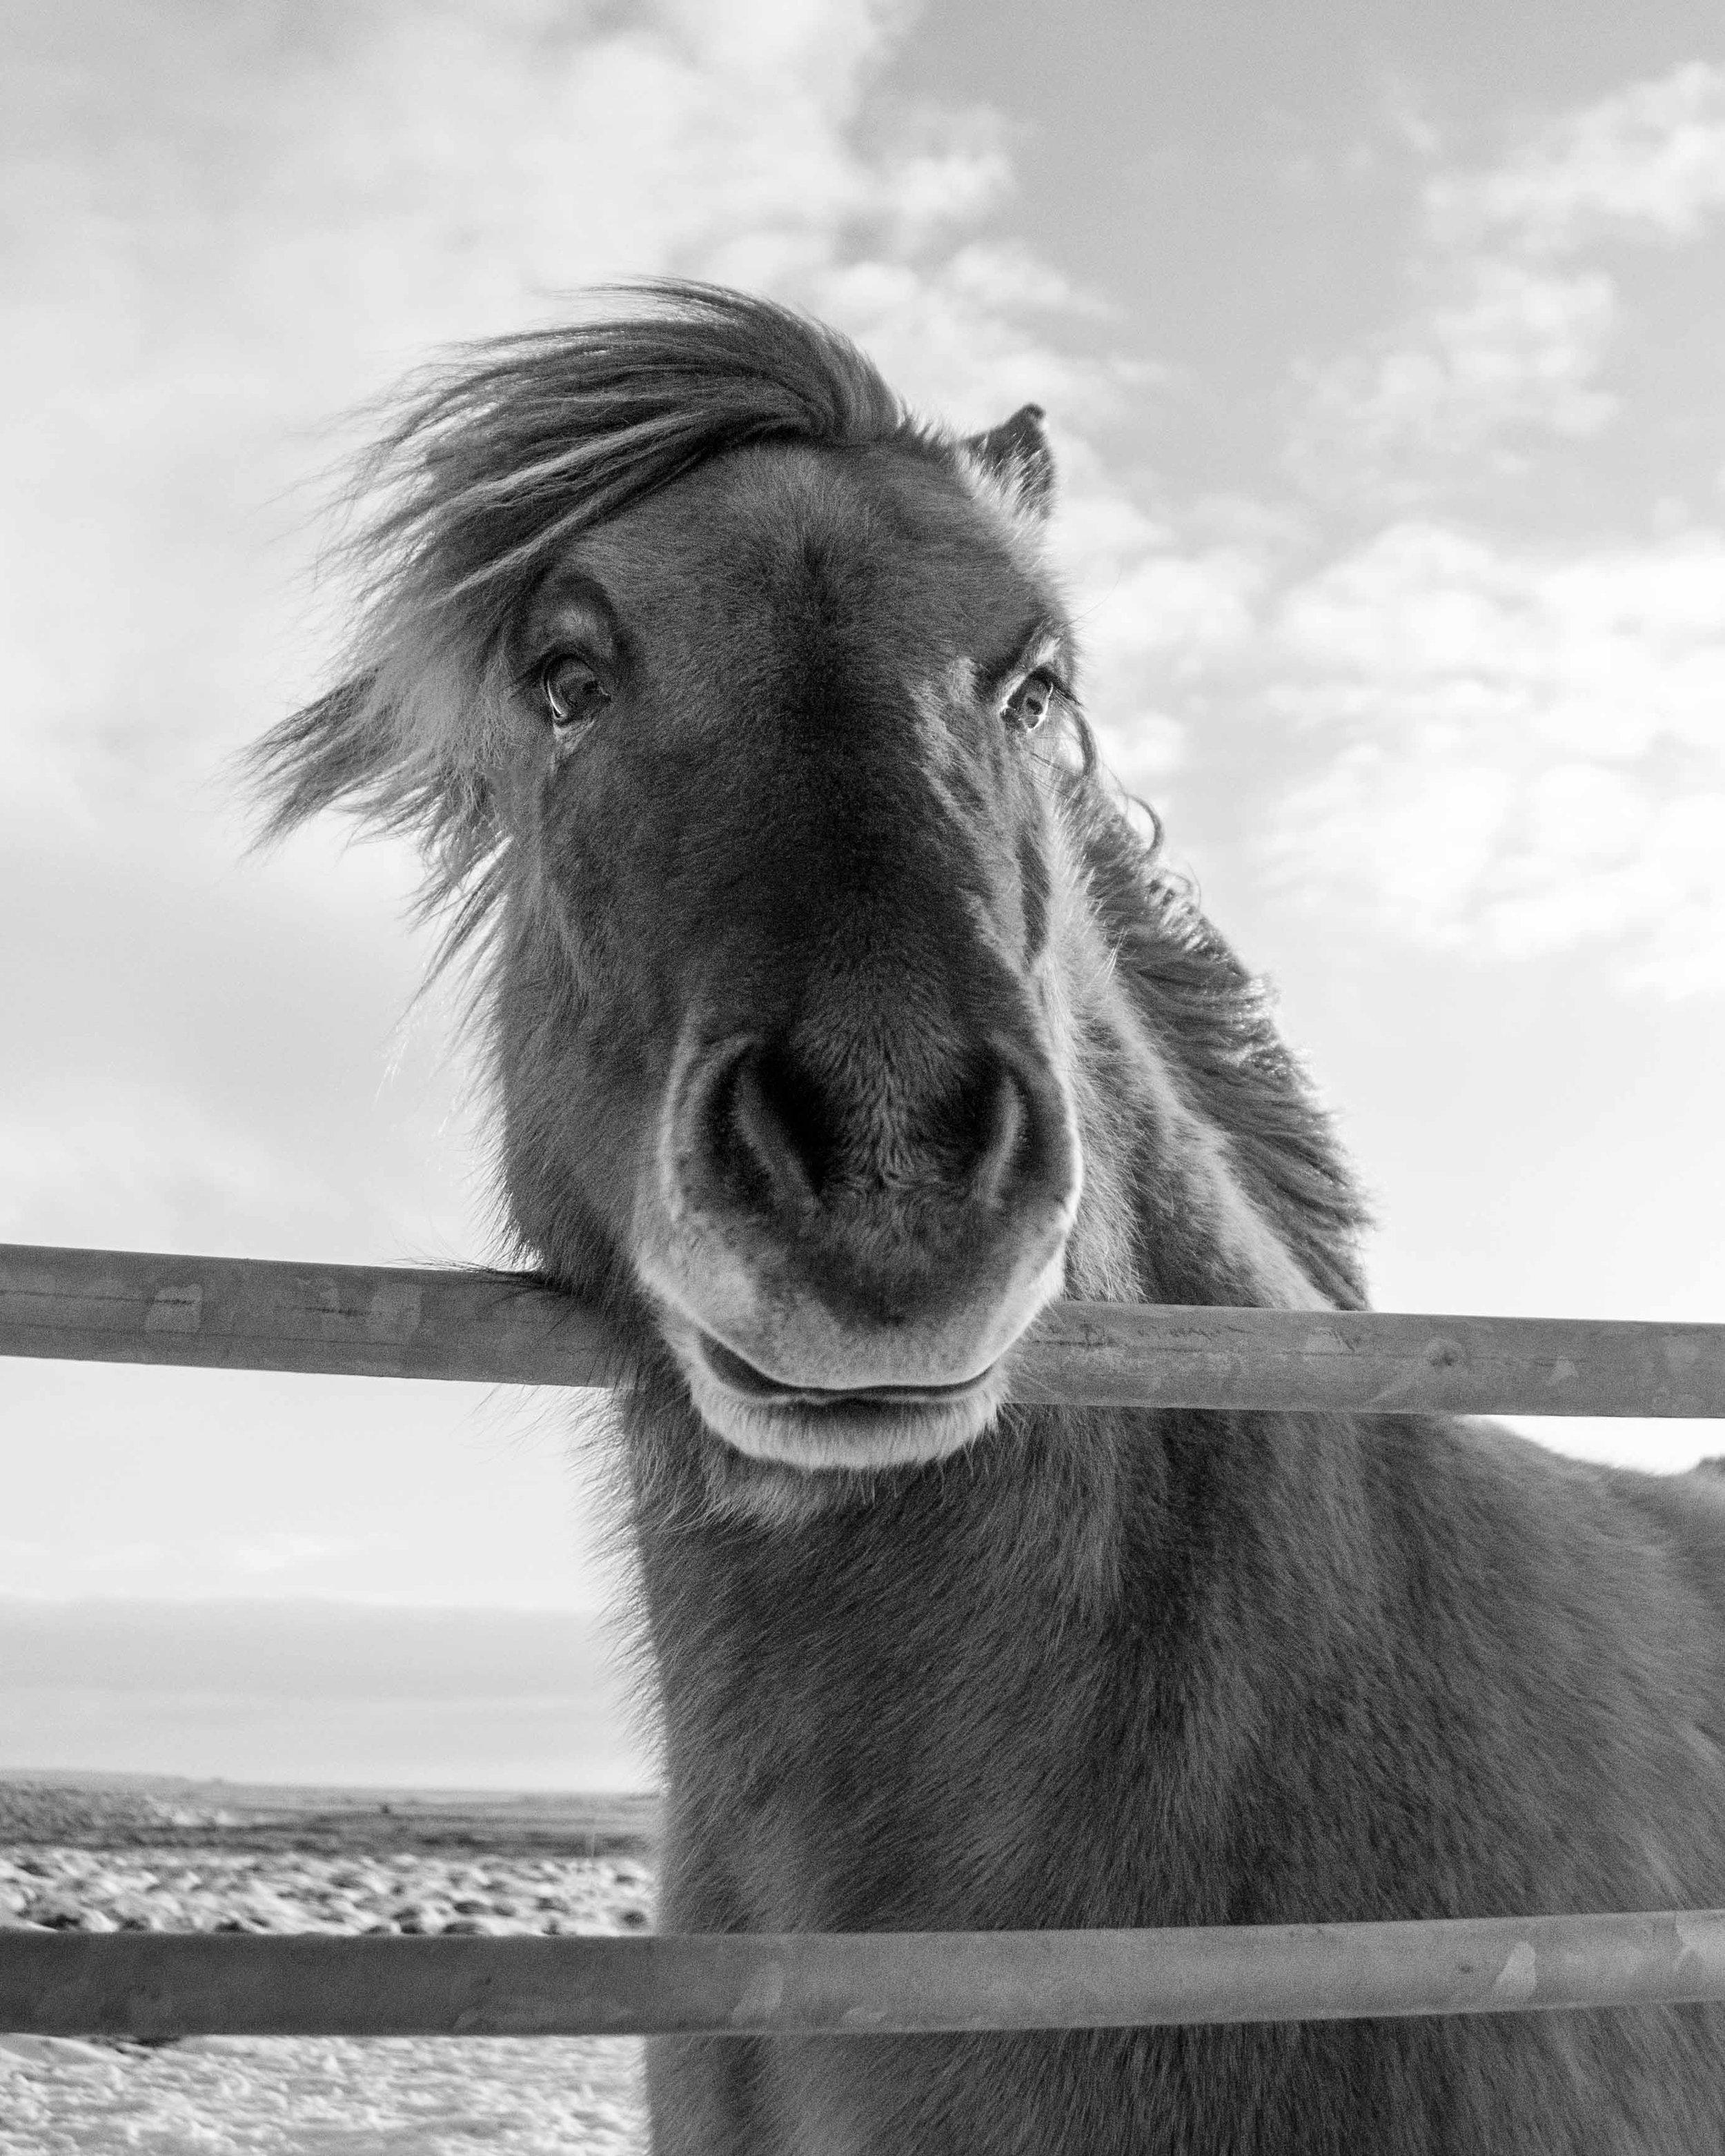 Iceland_Horses_11232017_04.jpg